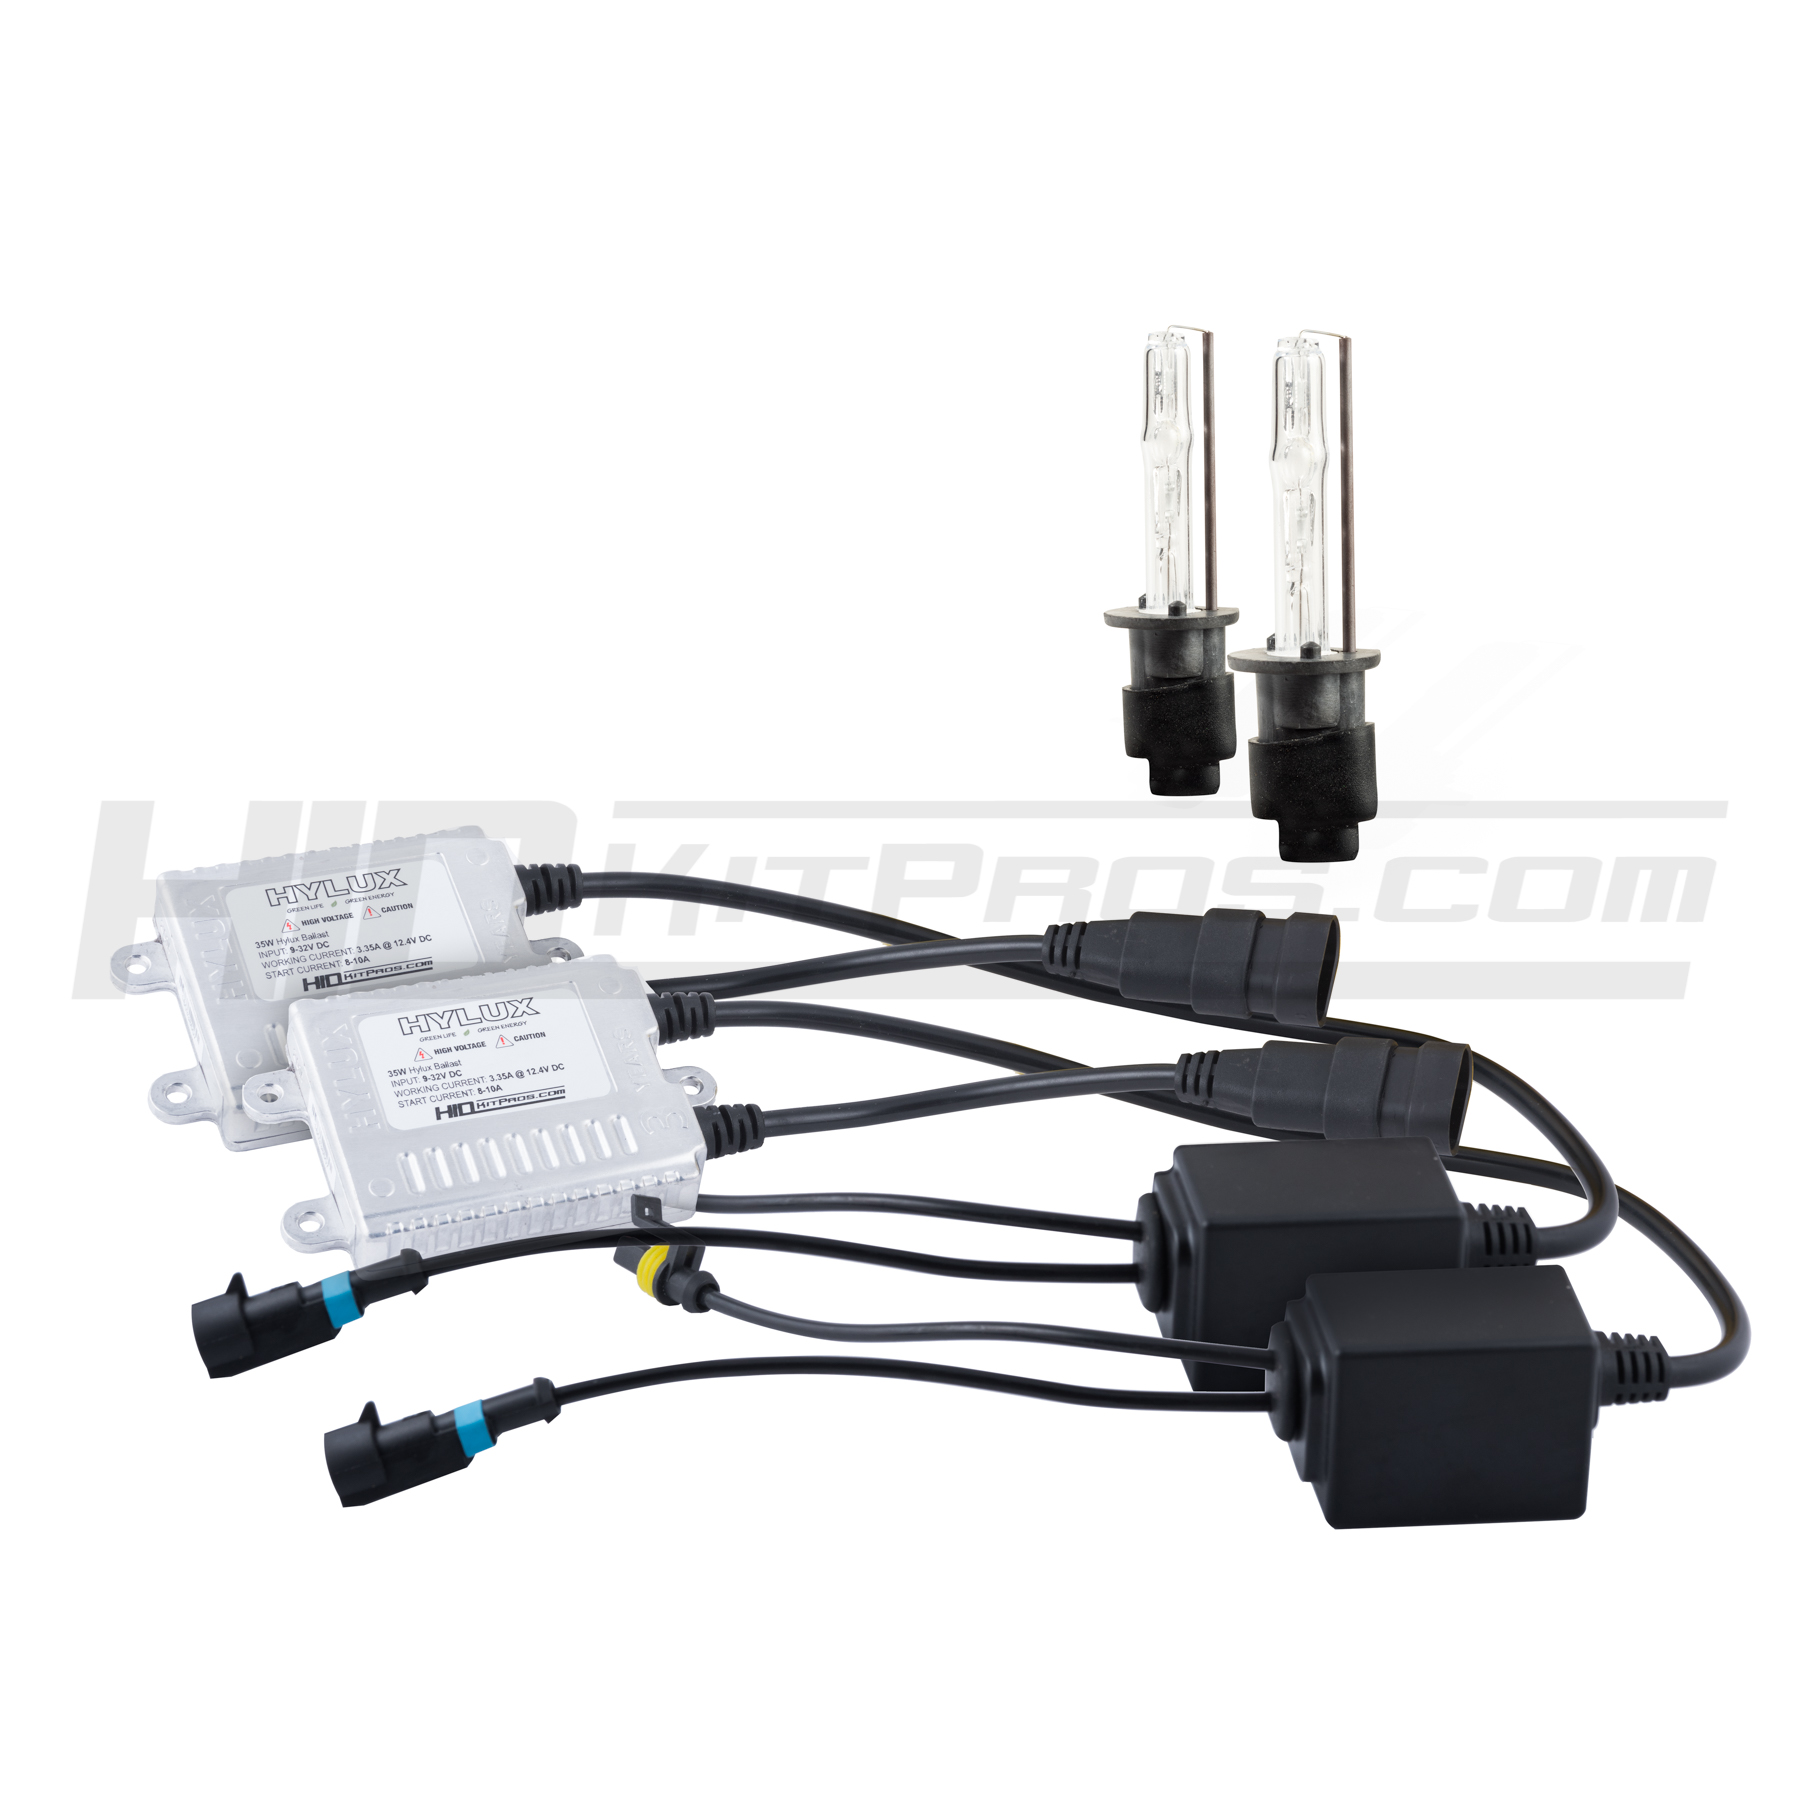 [DIAGRAM_38IU]  1999-2007 Lexus LX470 | HYLUX Low Beam HID Conversion Kit | Lexus Lx470 Headlight Wiring Harness |  | HID Kit Pros